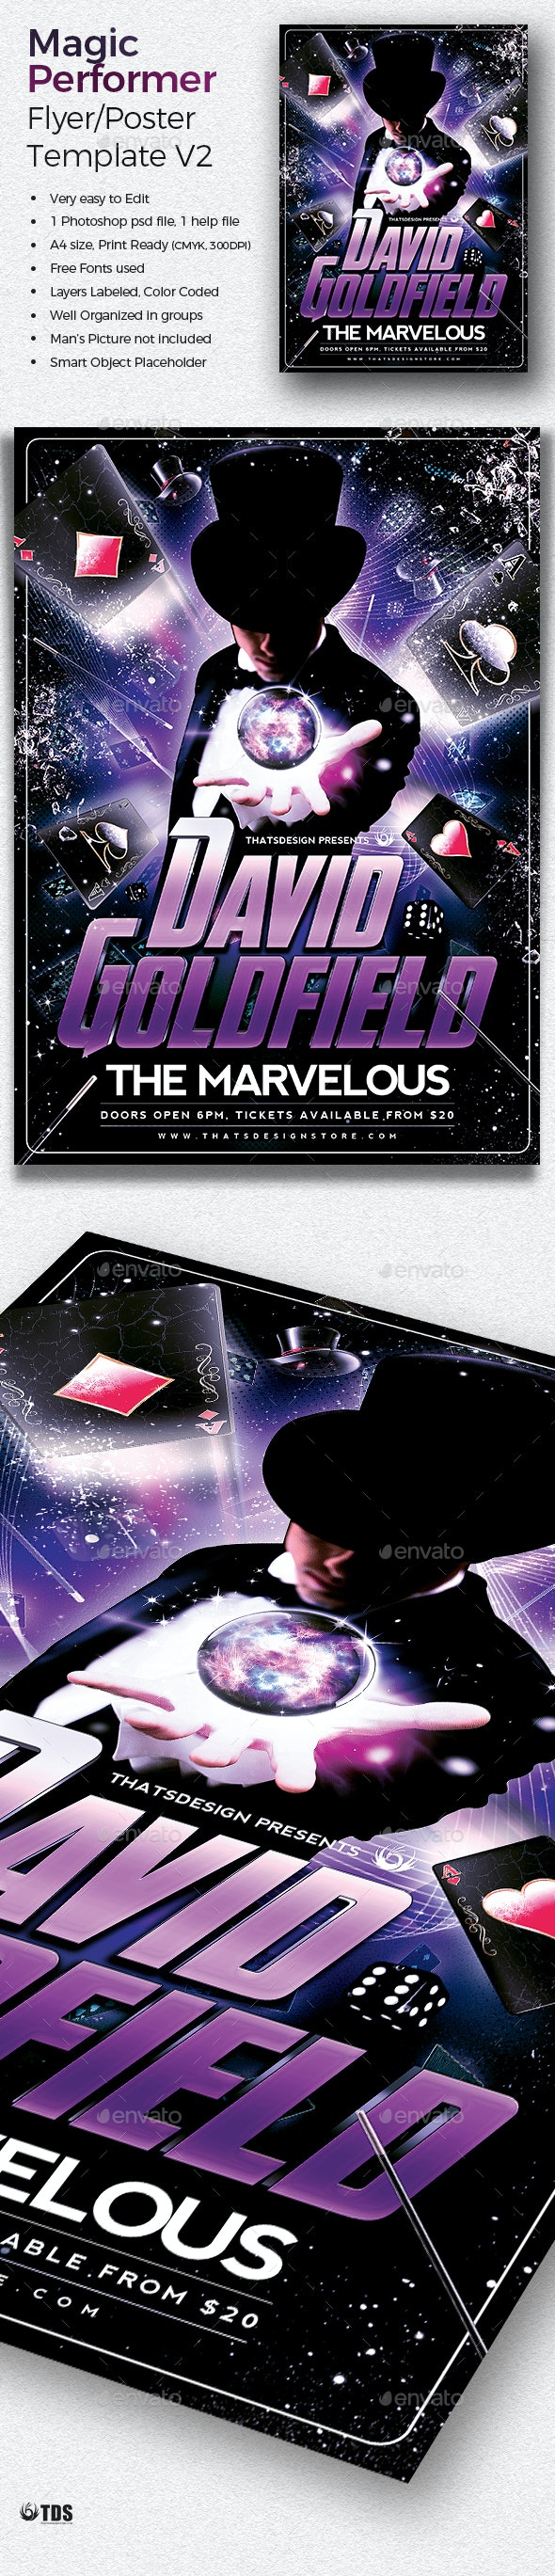 Magic Performer Flyer Template V2 - Concerts Events